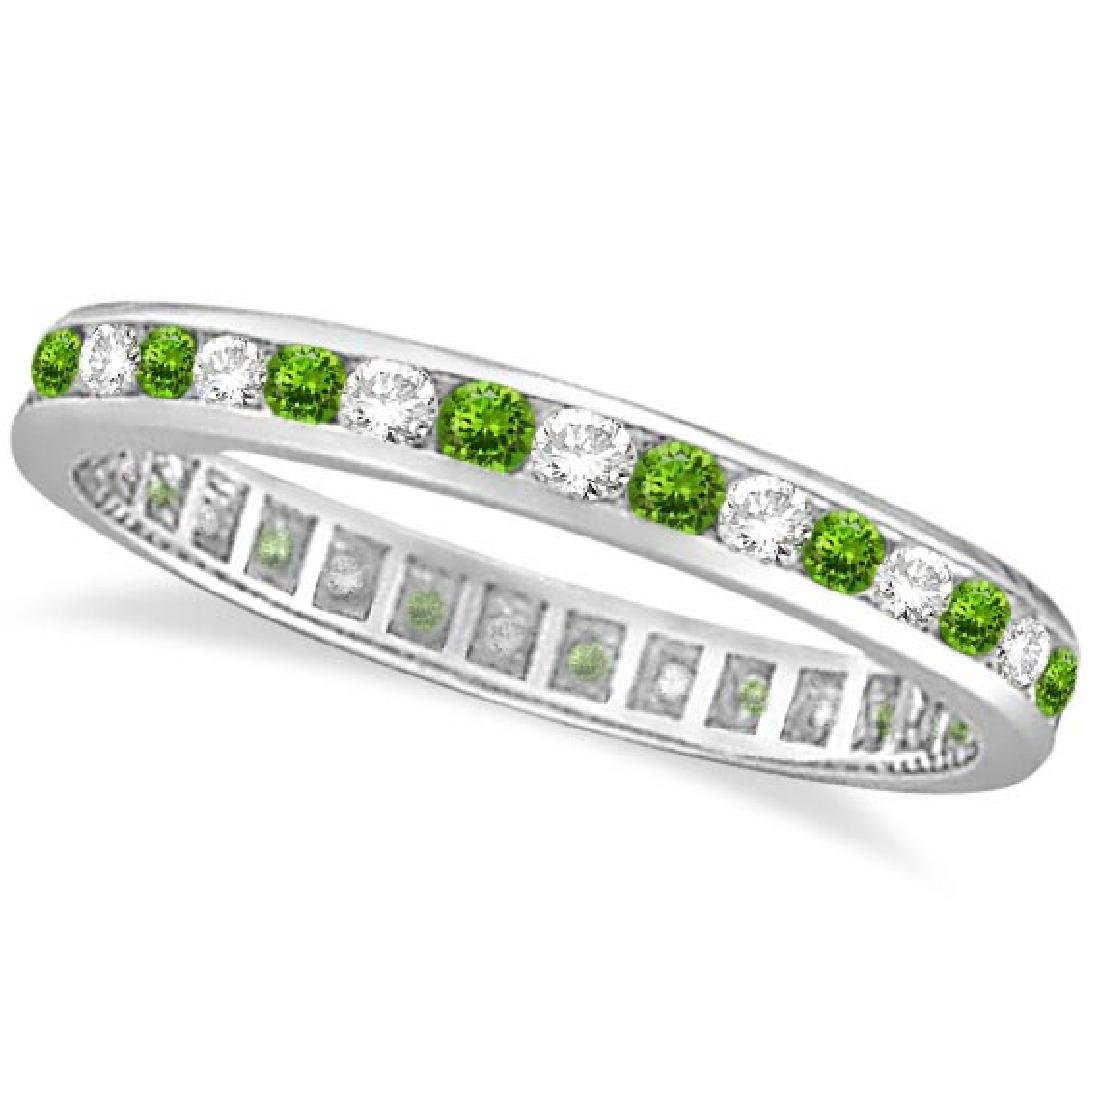 Peridot and Diamond Channel-Set Eternity Ring 14k White